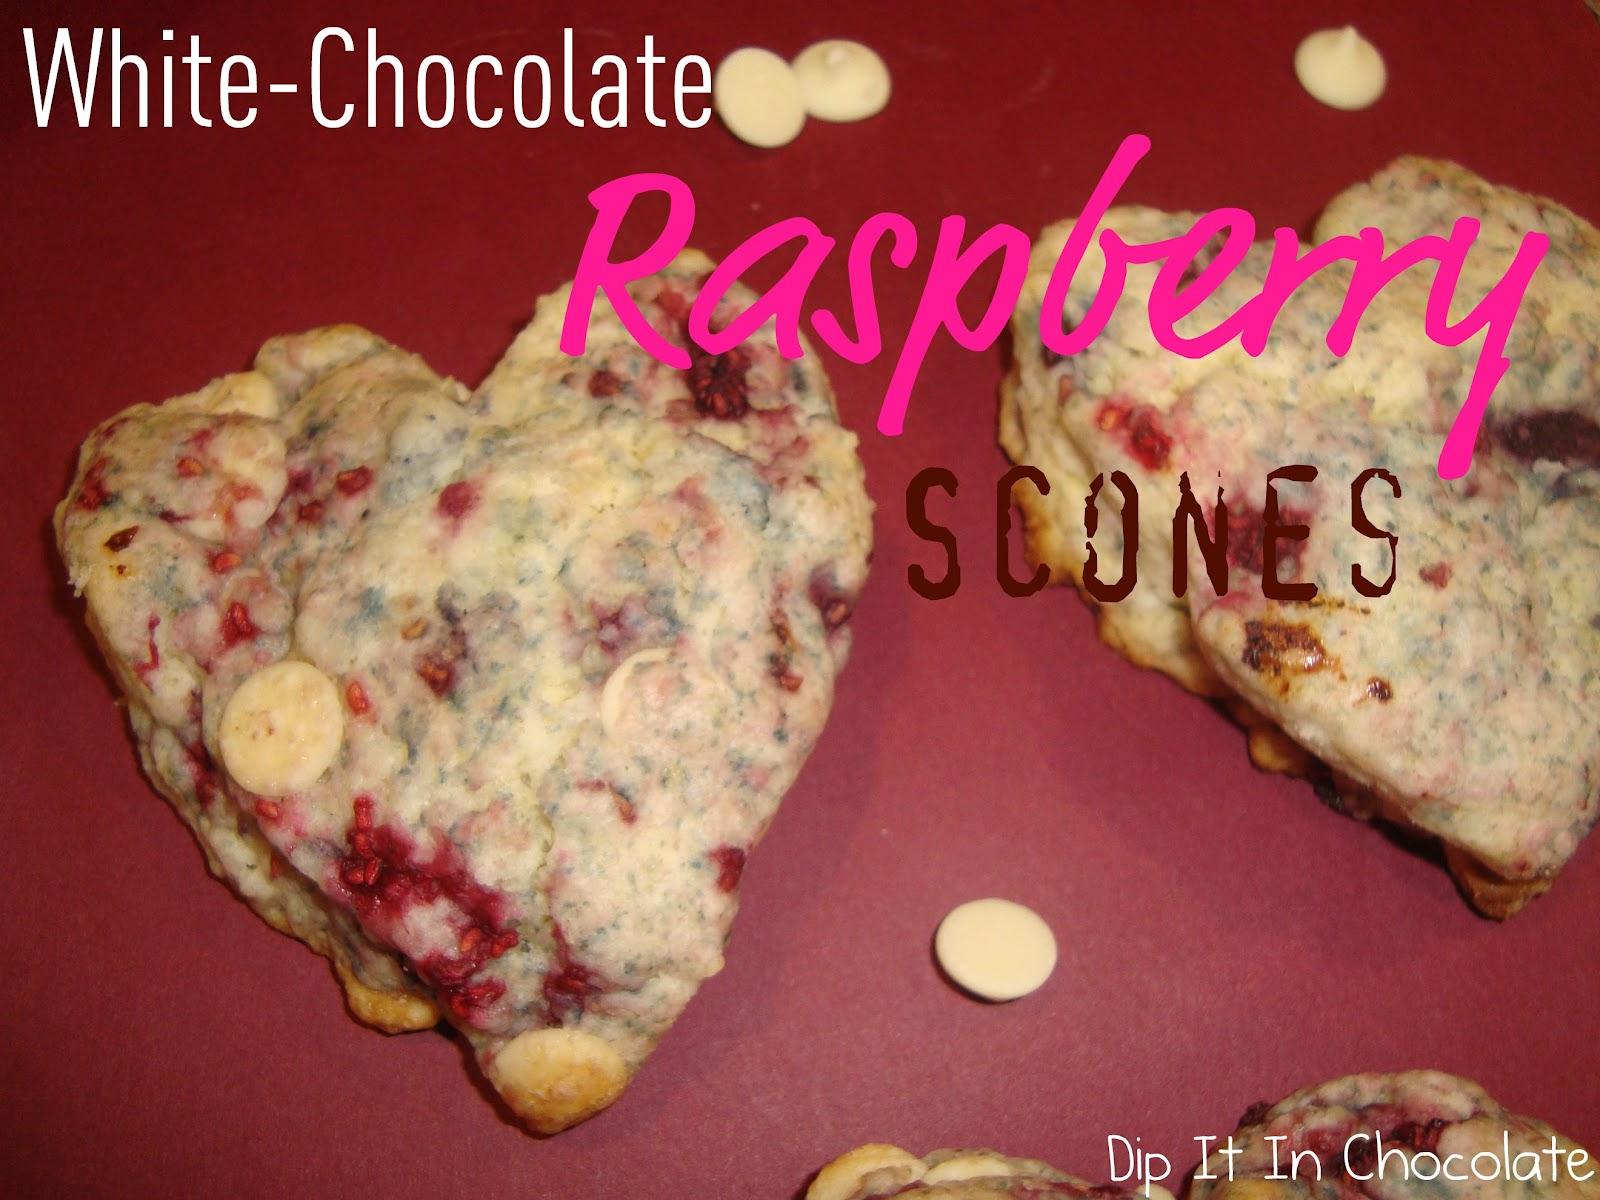 White Chocolate Raspberry Scones ~ Dip it in Chocolate